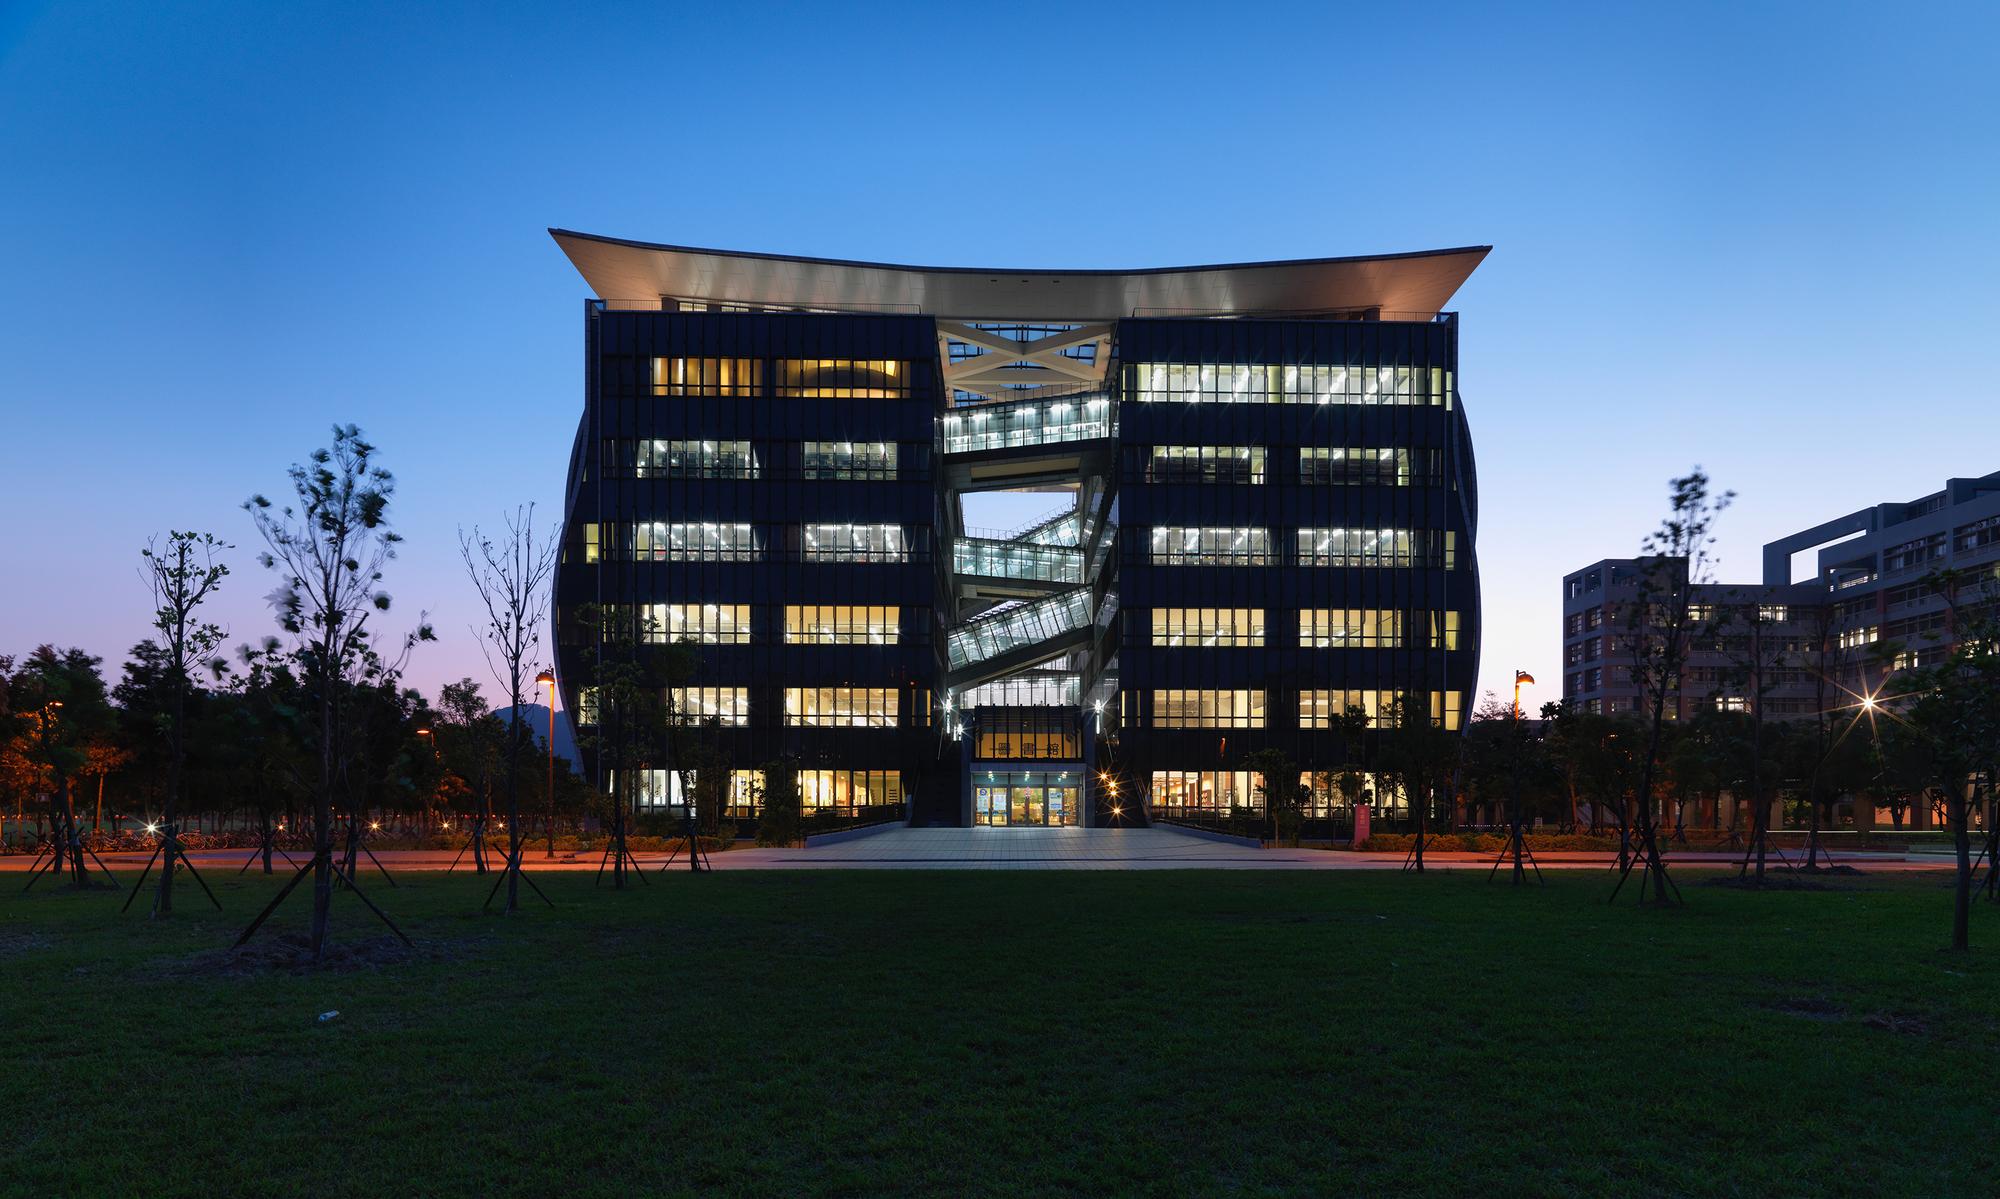 54d085fde58ece5c5e0004cc_taipei-univesity-library-liao-architect-associates_ssly_13931